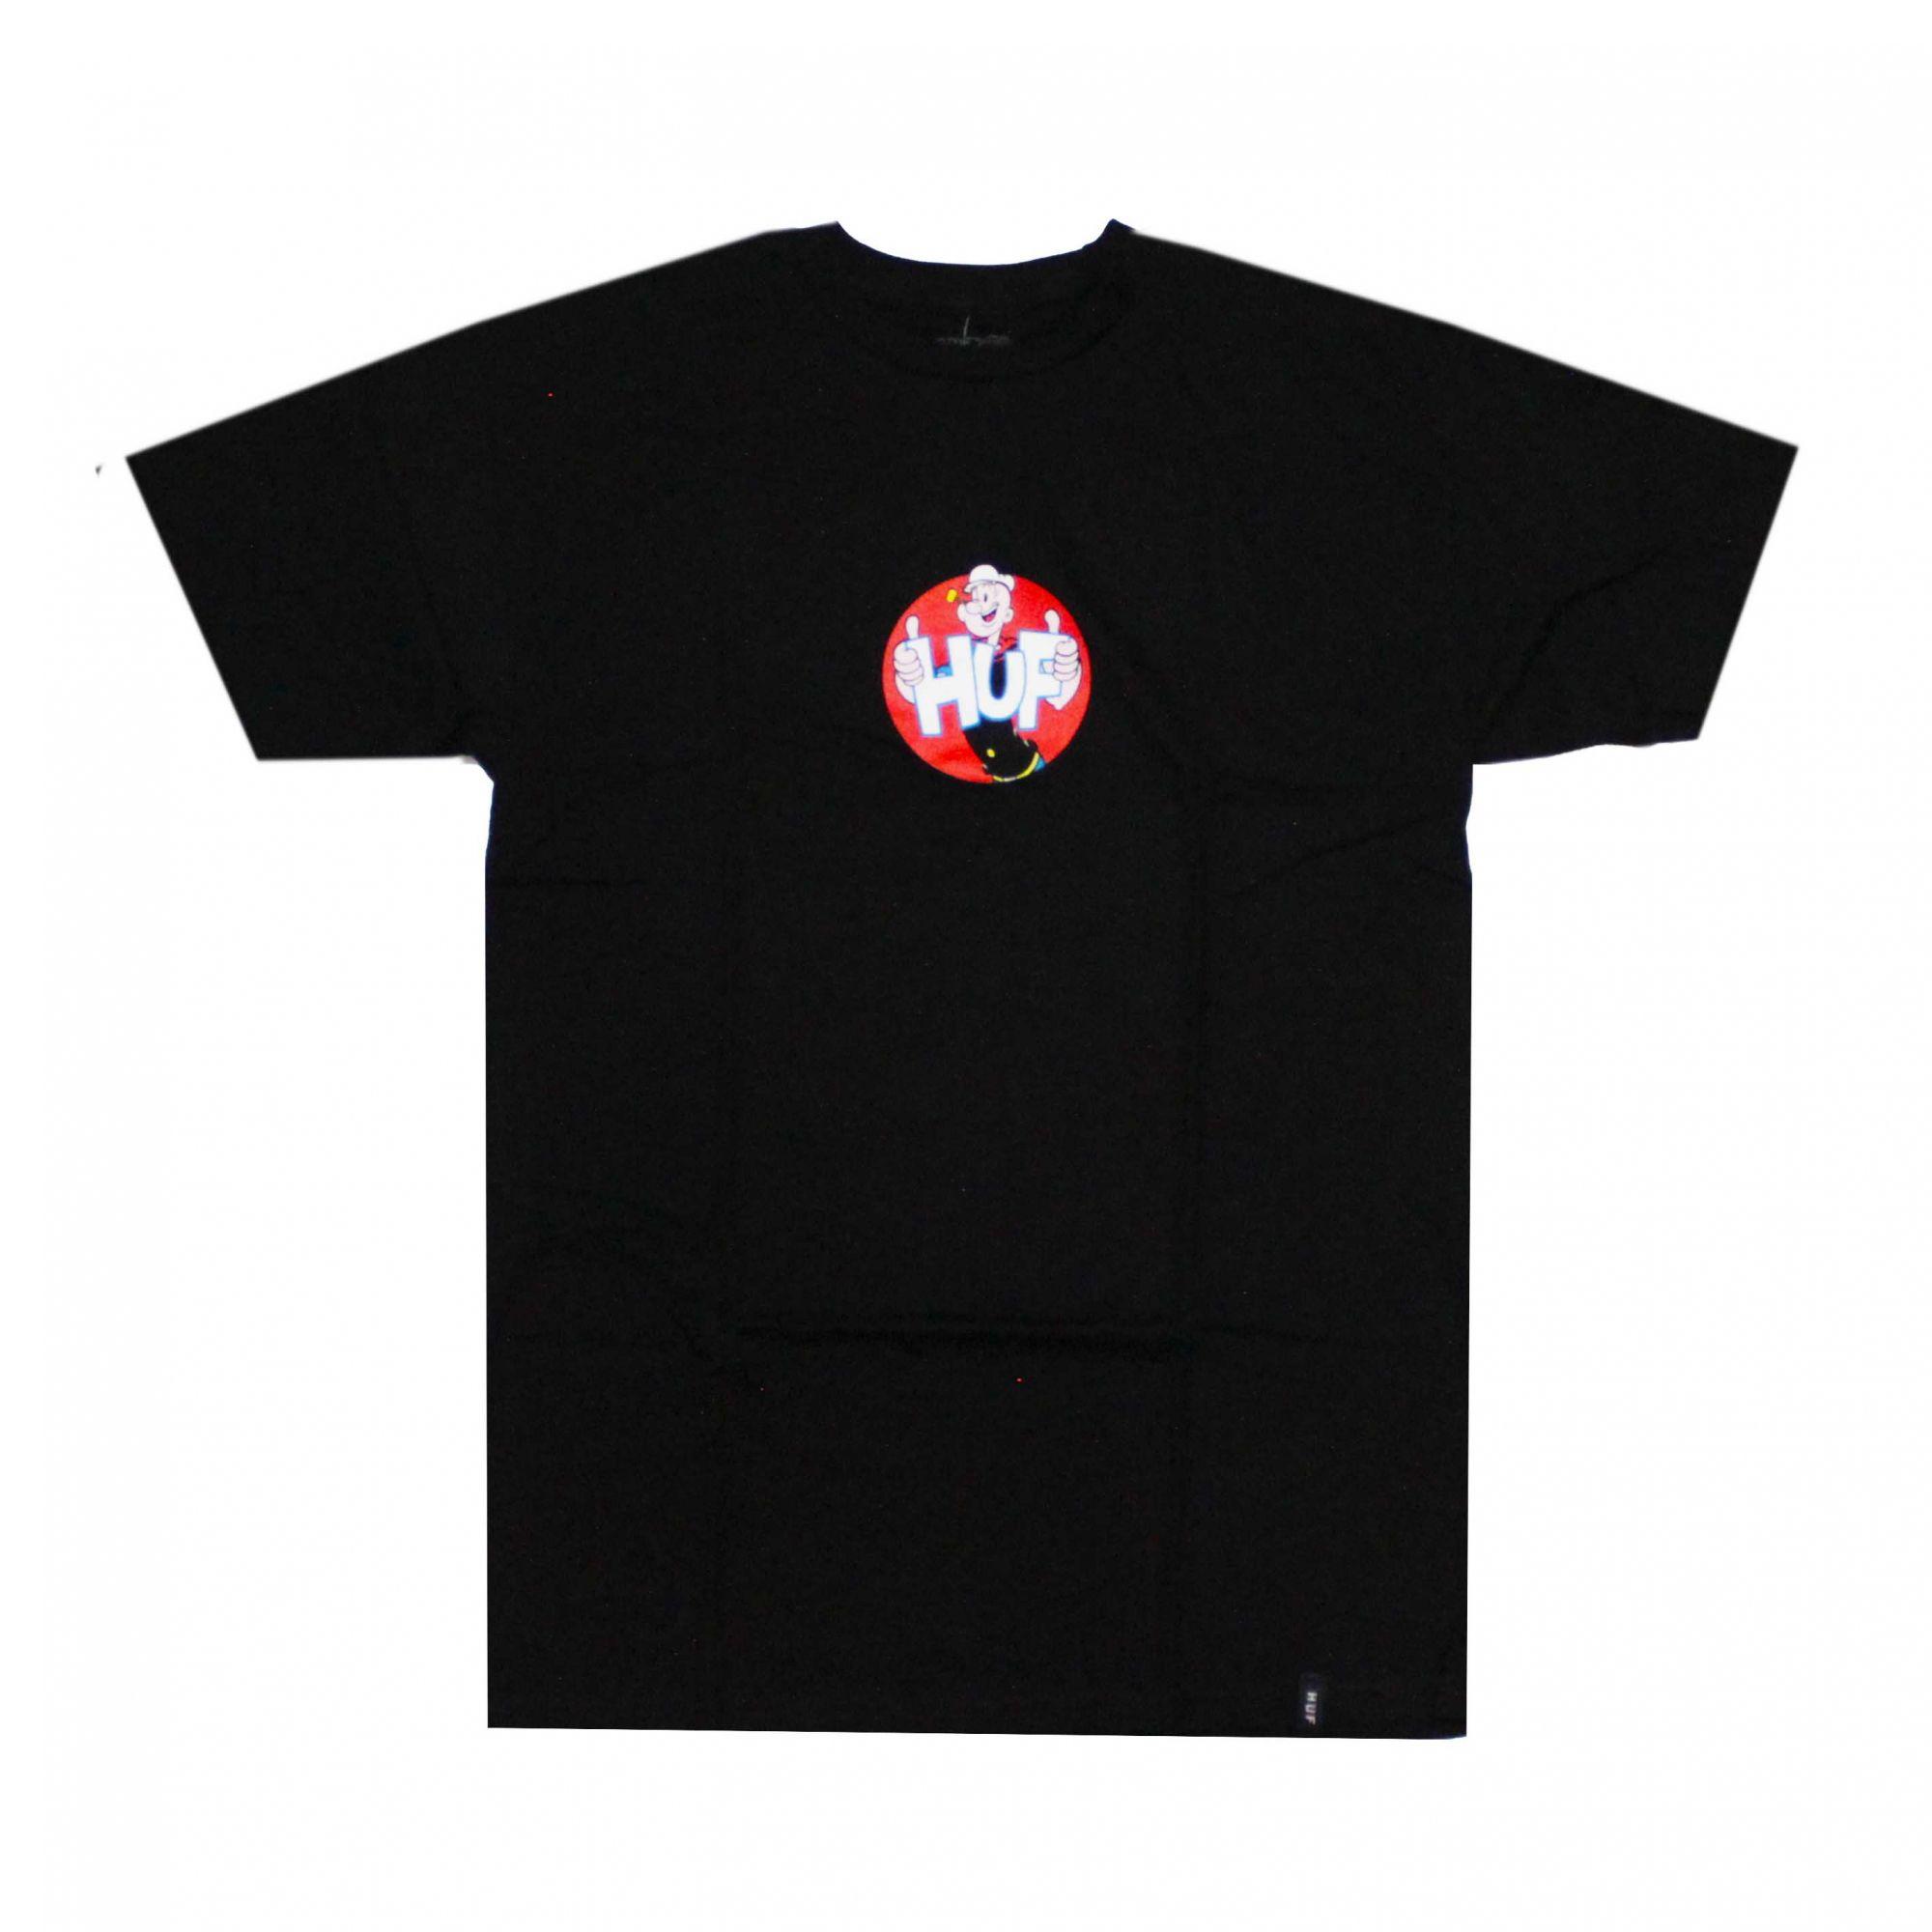 Camiseta HUF x Popeye Show Preto (Importado)